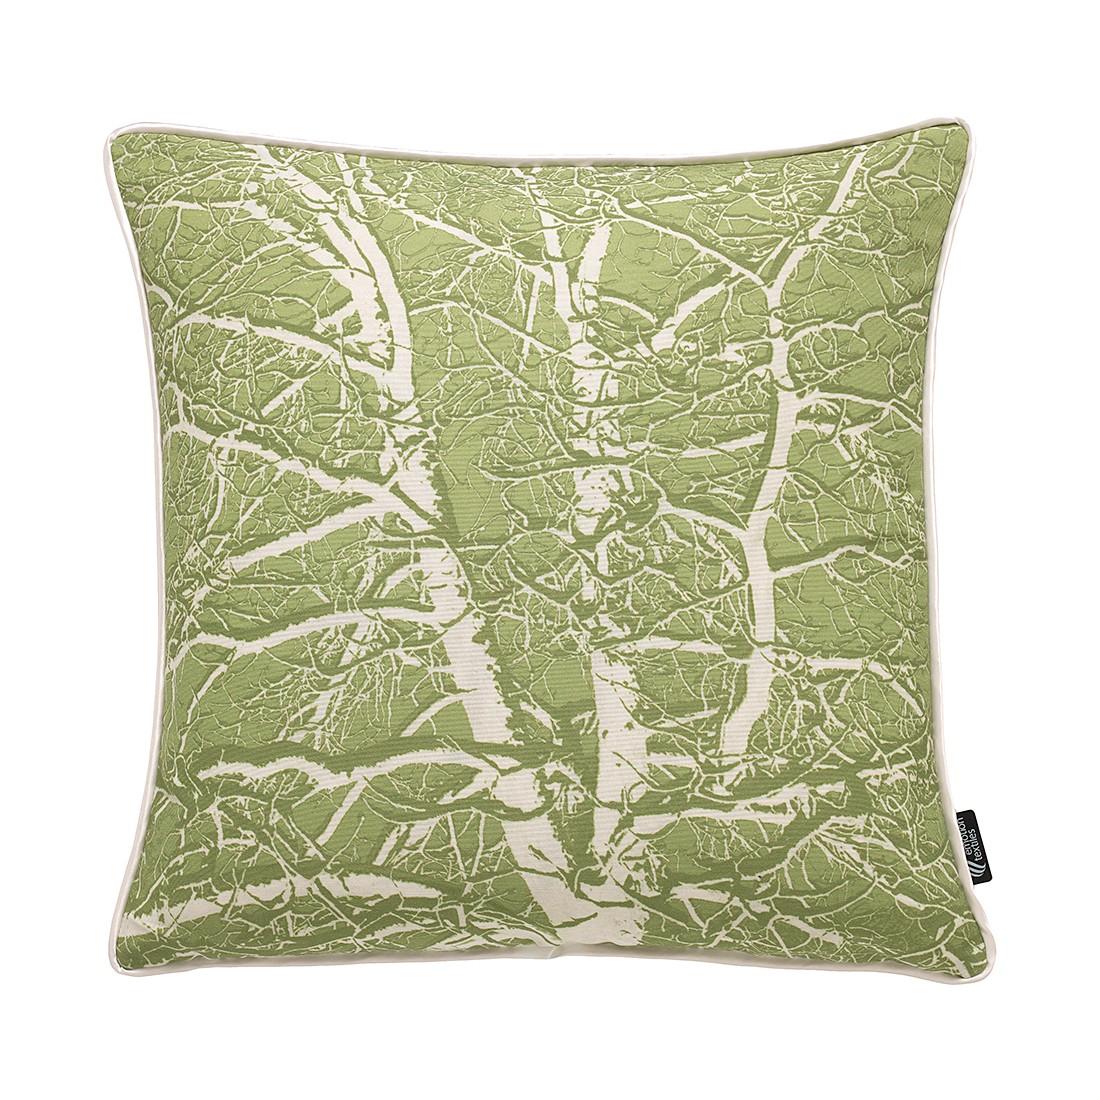 Kissenhülle Birke – Grün, emotion textiles günstig kaufen